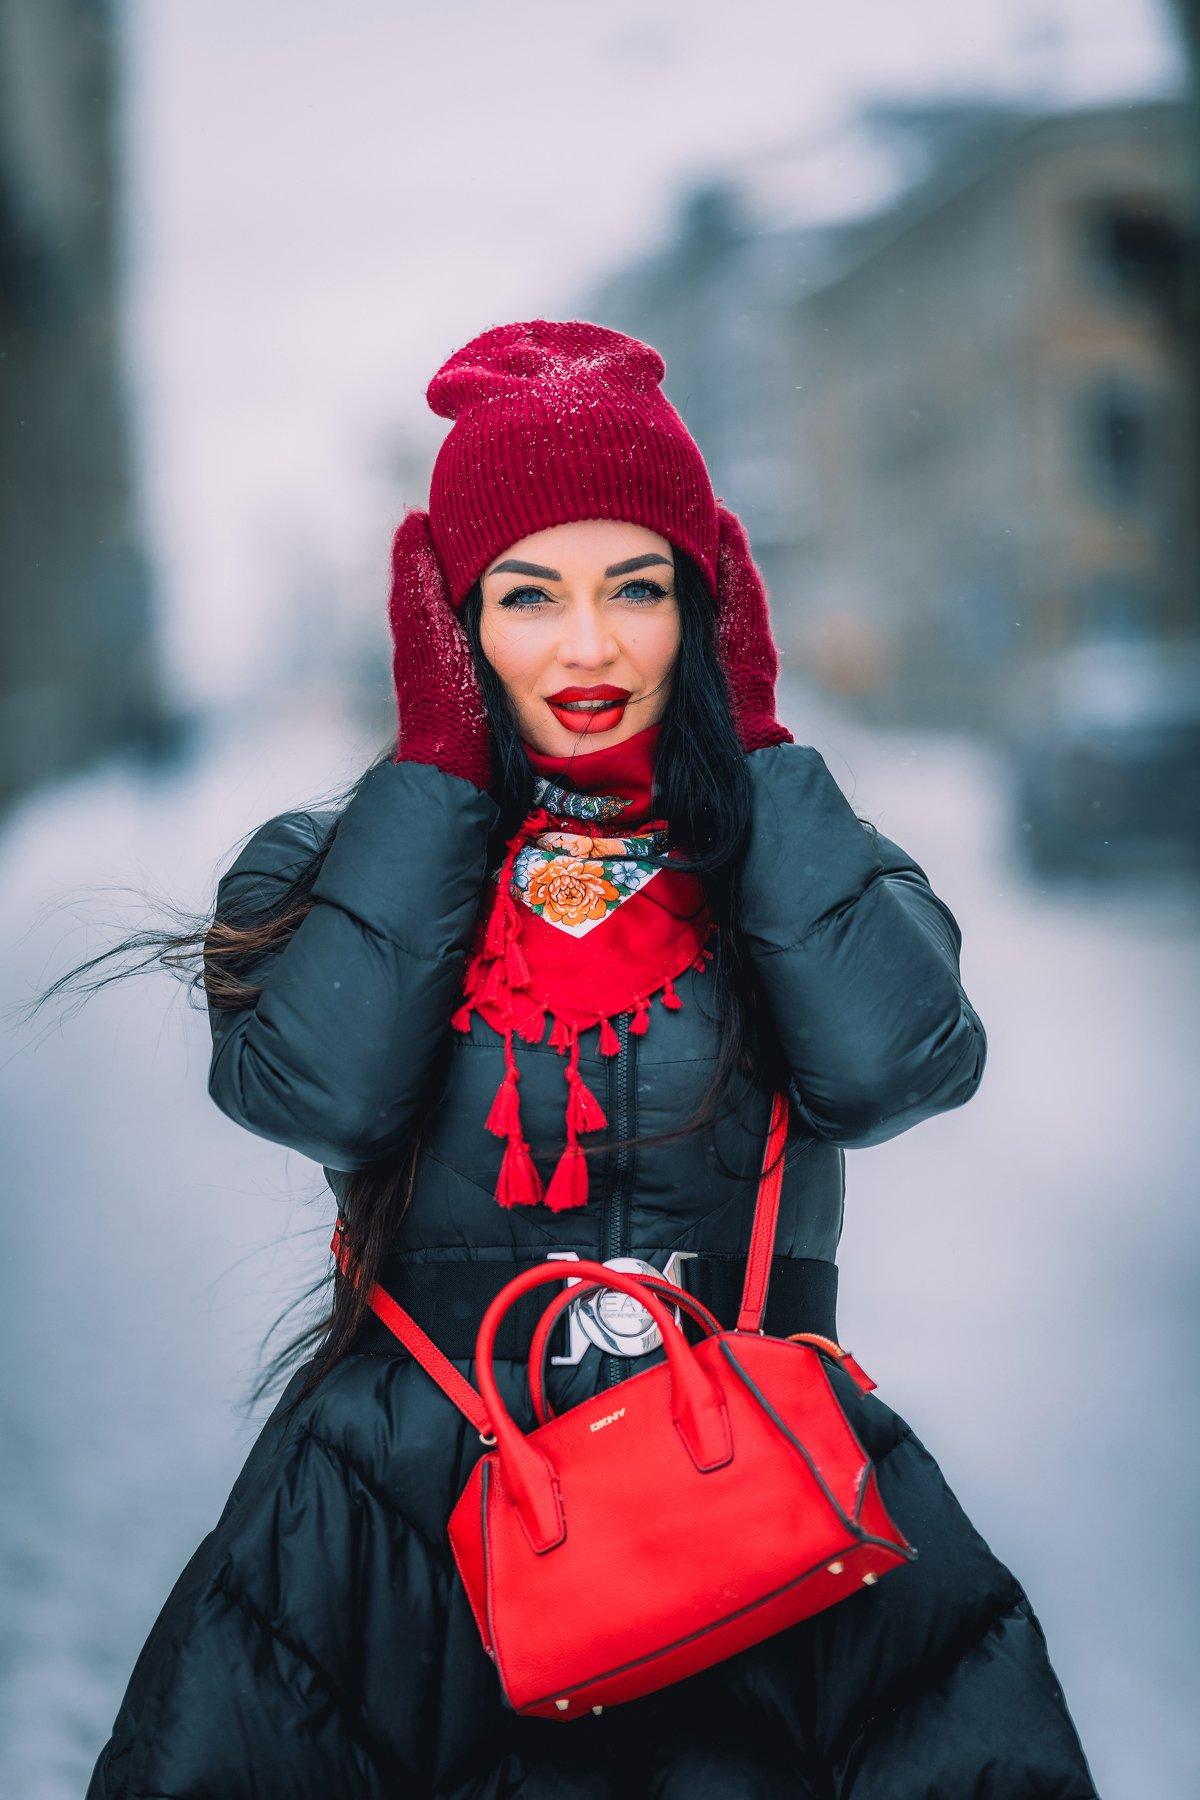 #portrait, #girl, #girls, #snow, #winter, #city, #портрет, #девушка, #город, #зима, #снег, Andrei Mikhailov